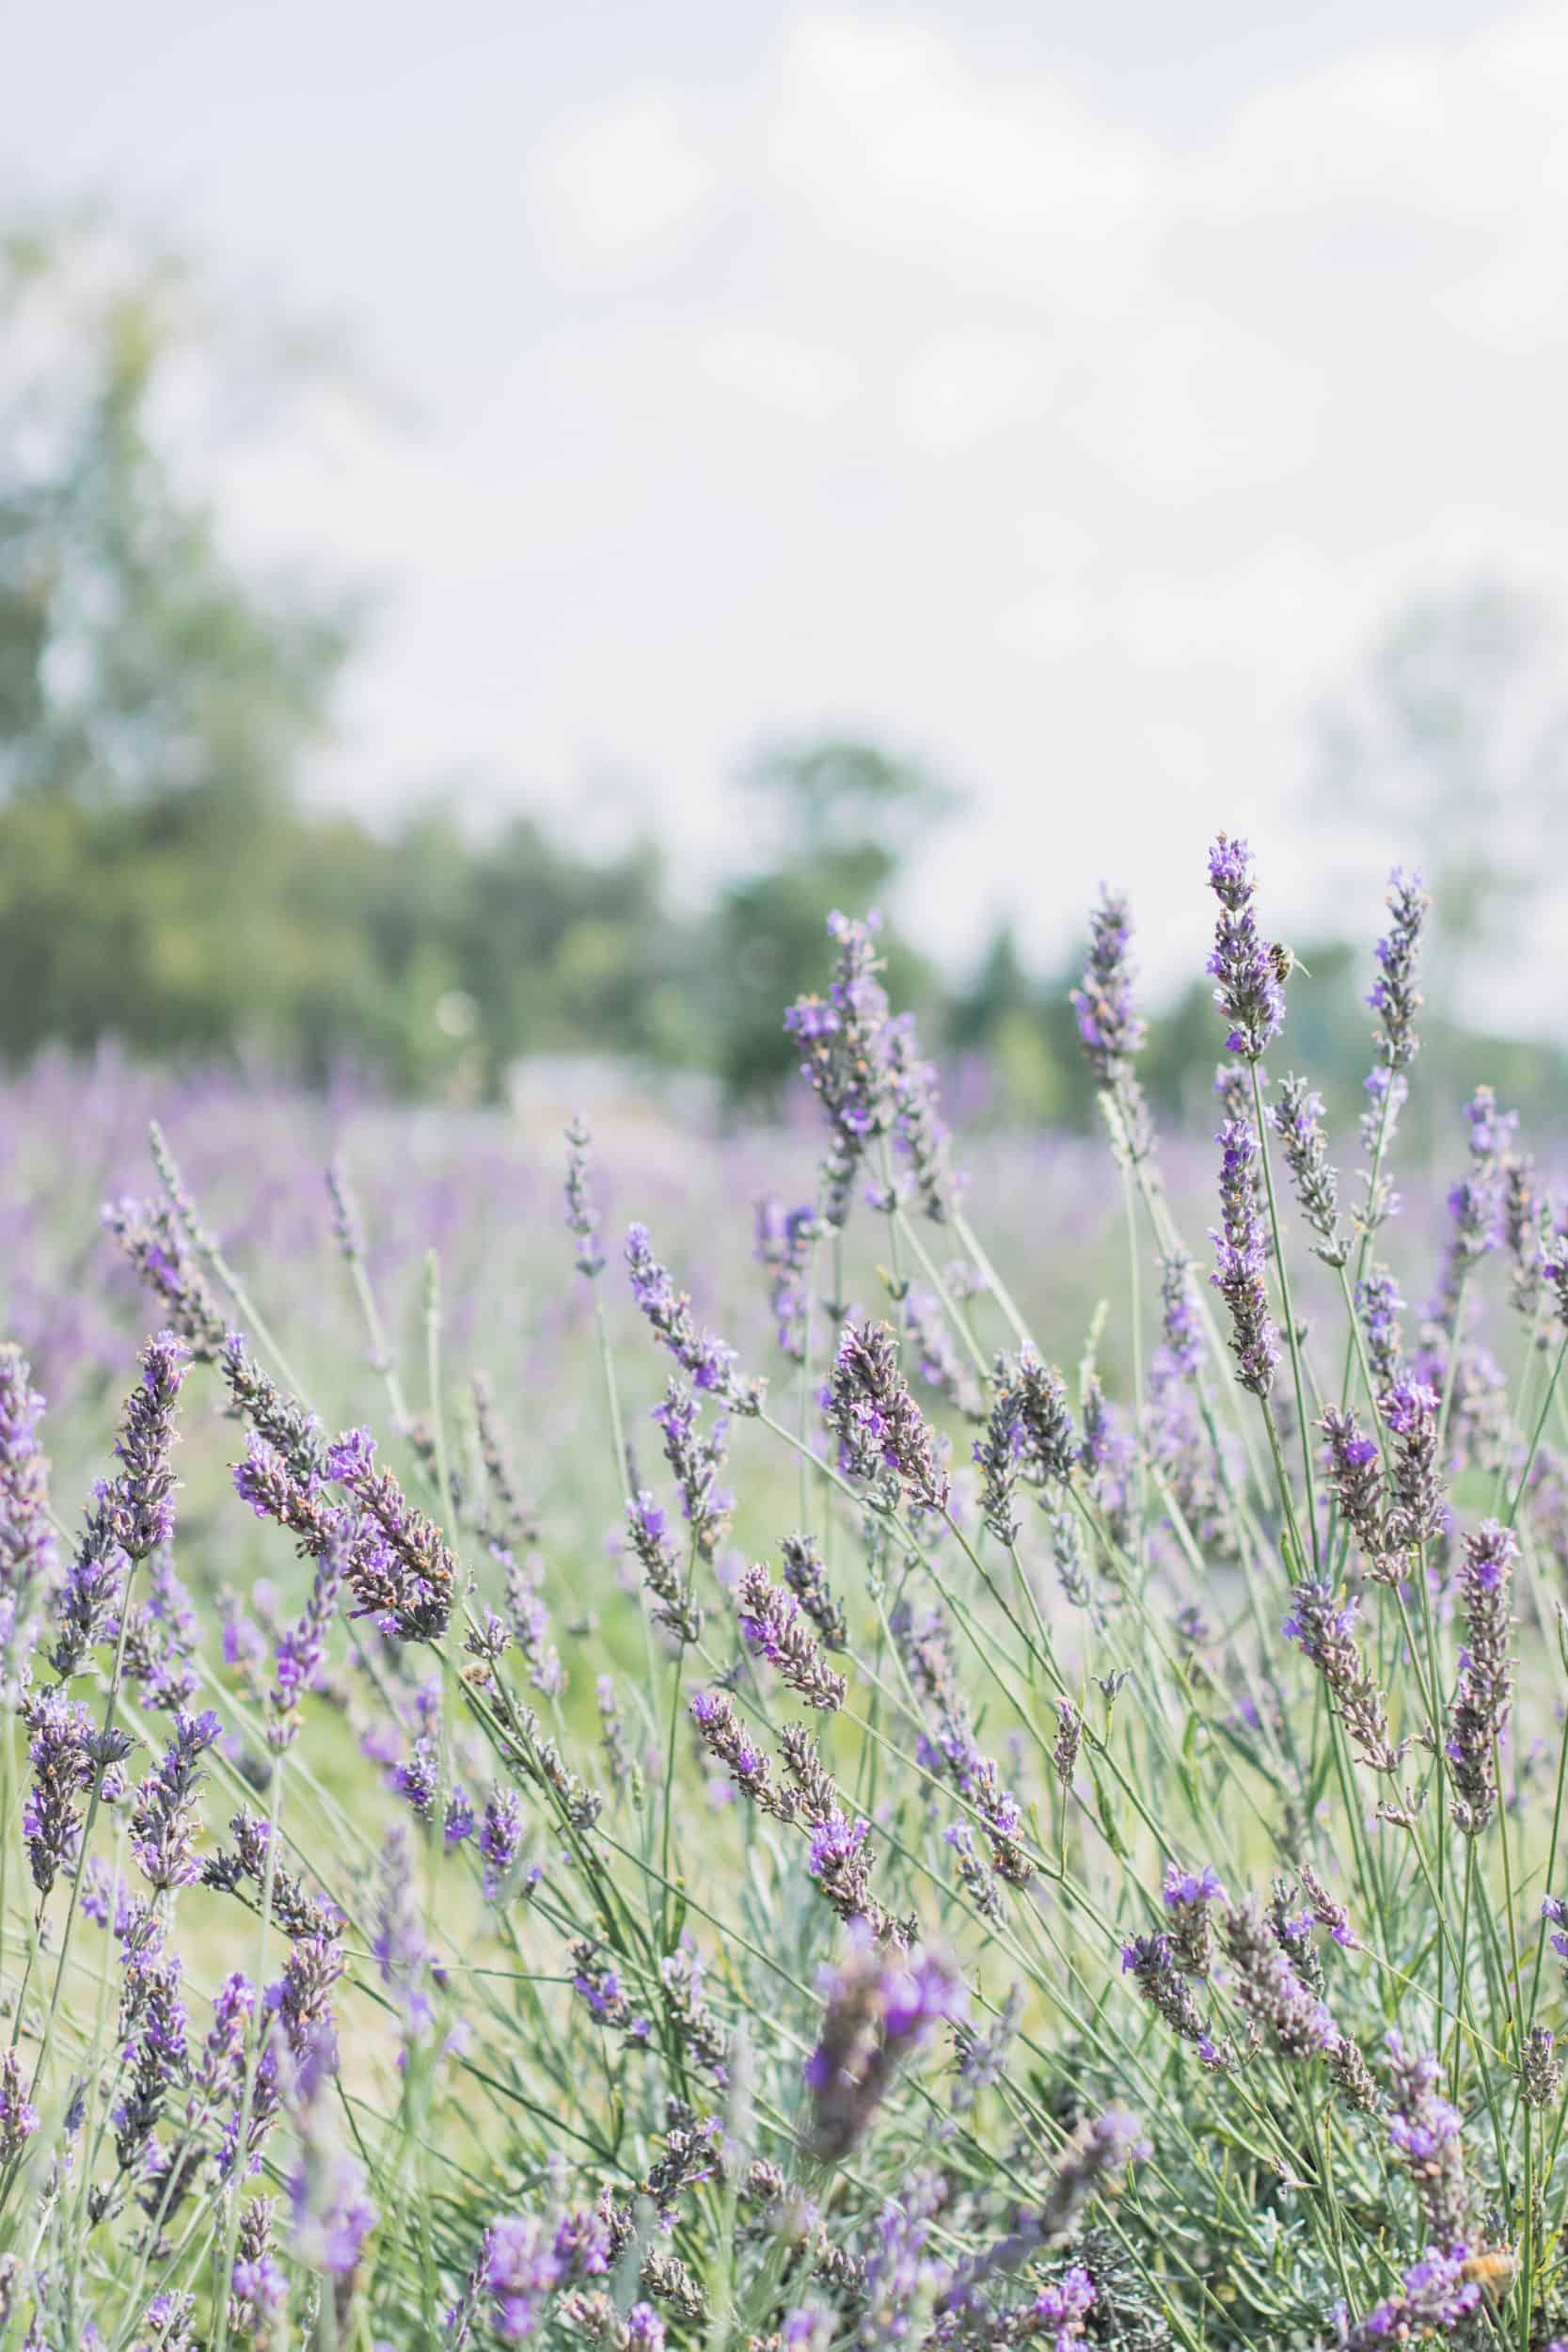 Terre Bleu Lavender Farm in Milton, Ontario